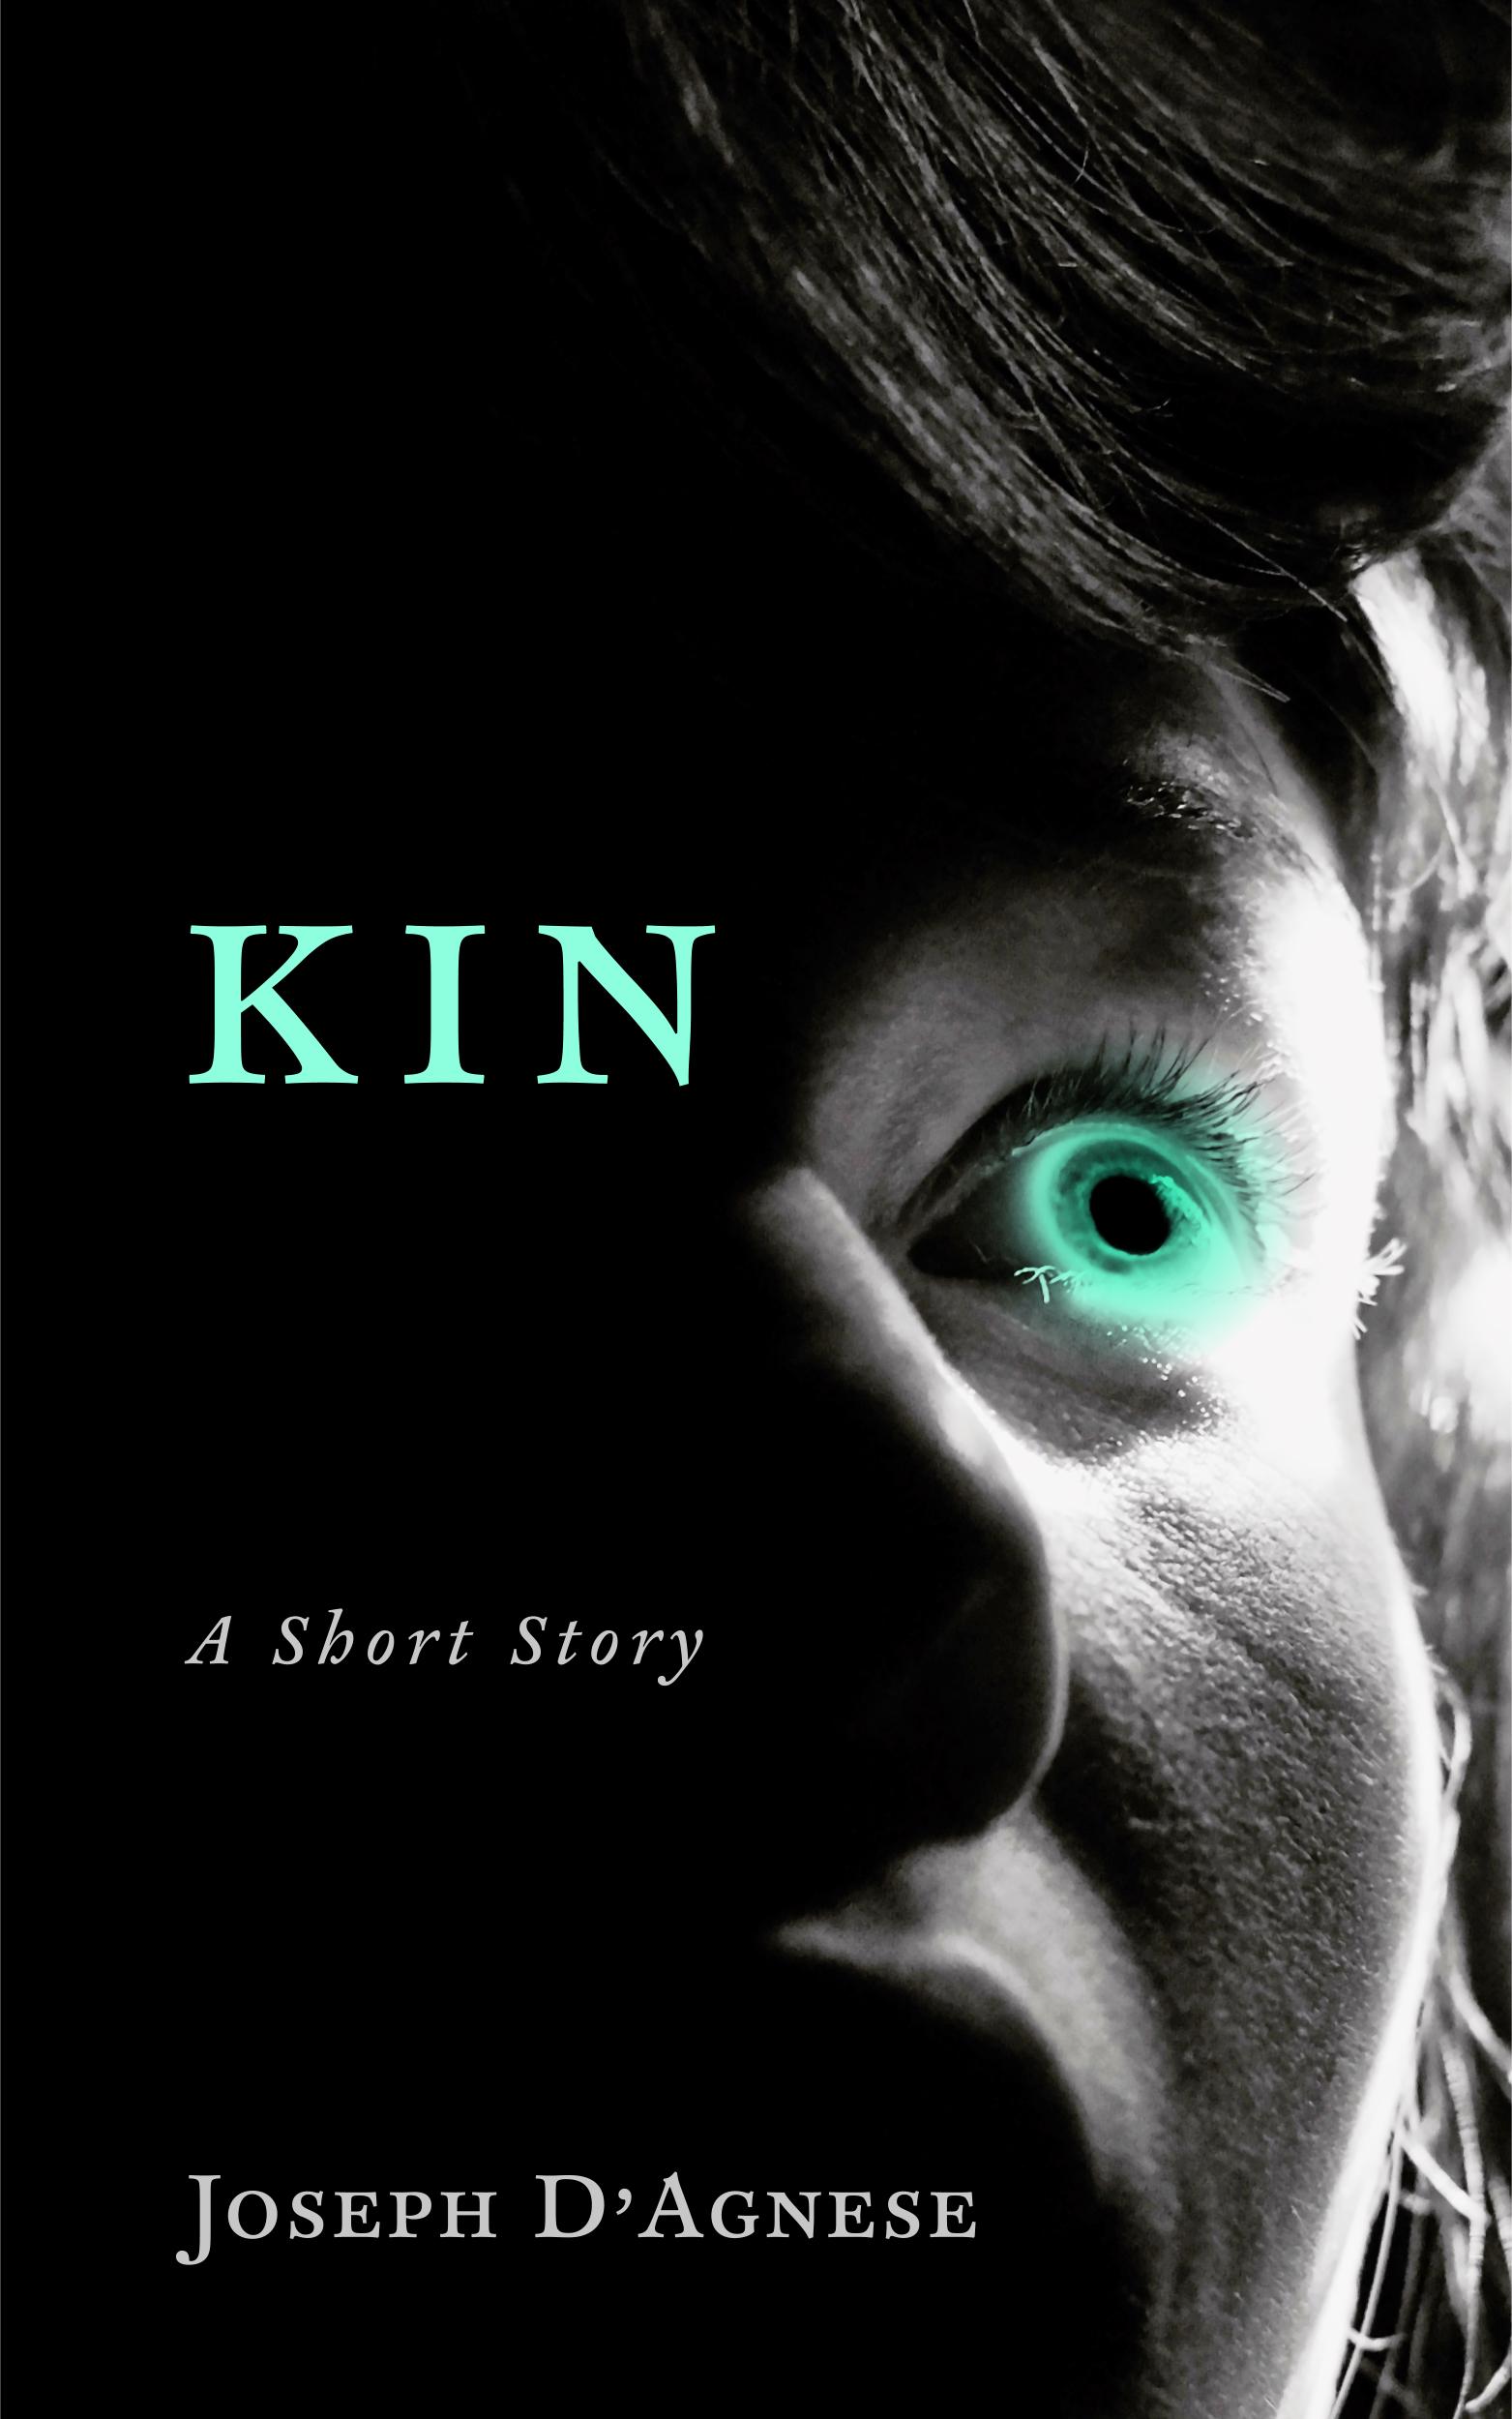 Kin by Joseph D'Agnese